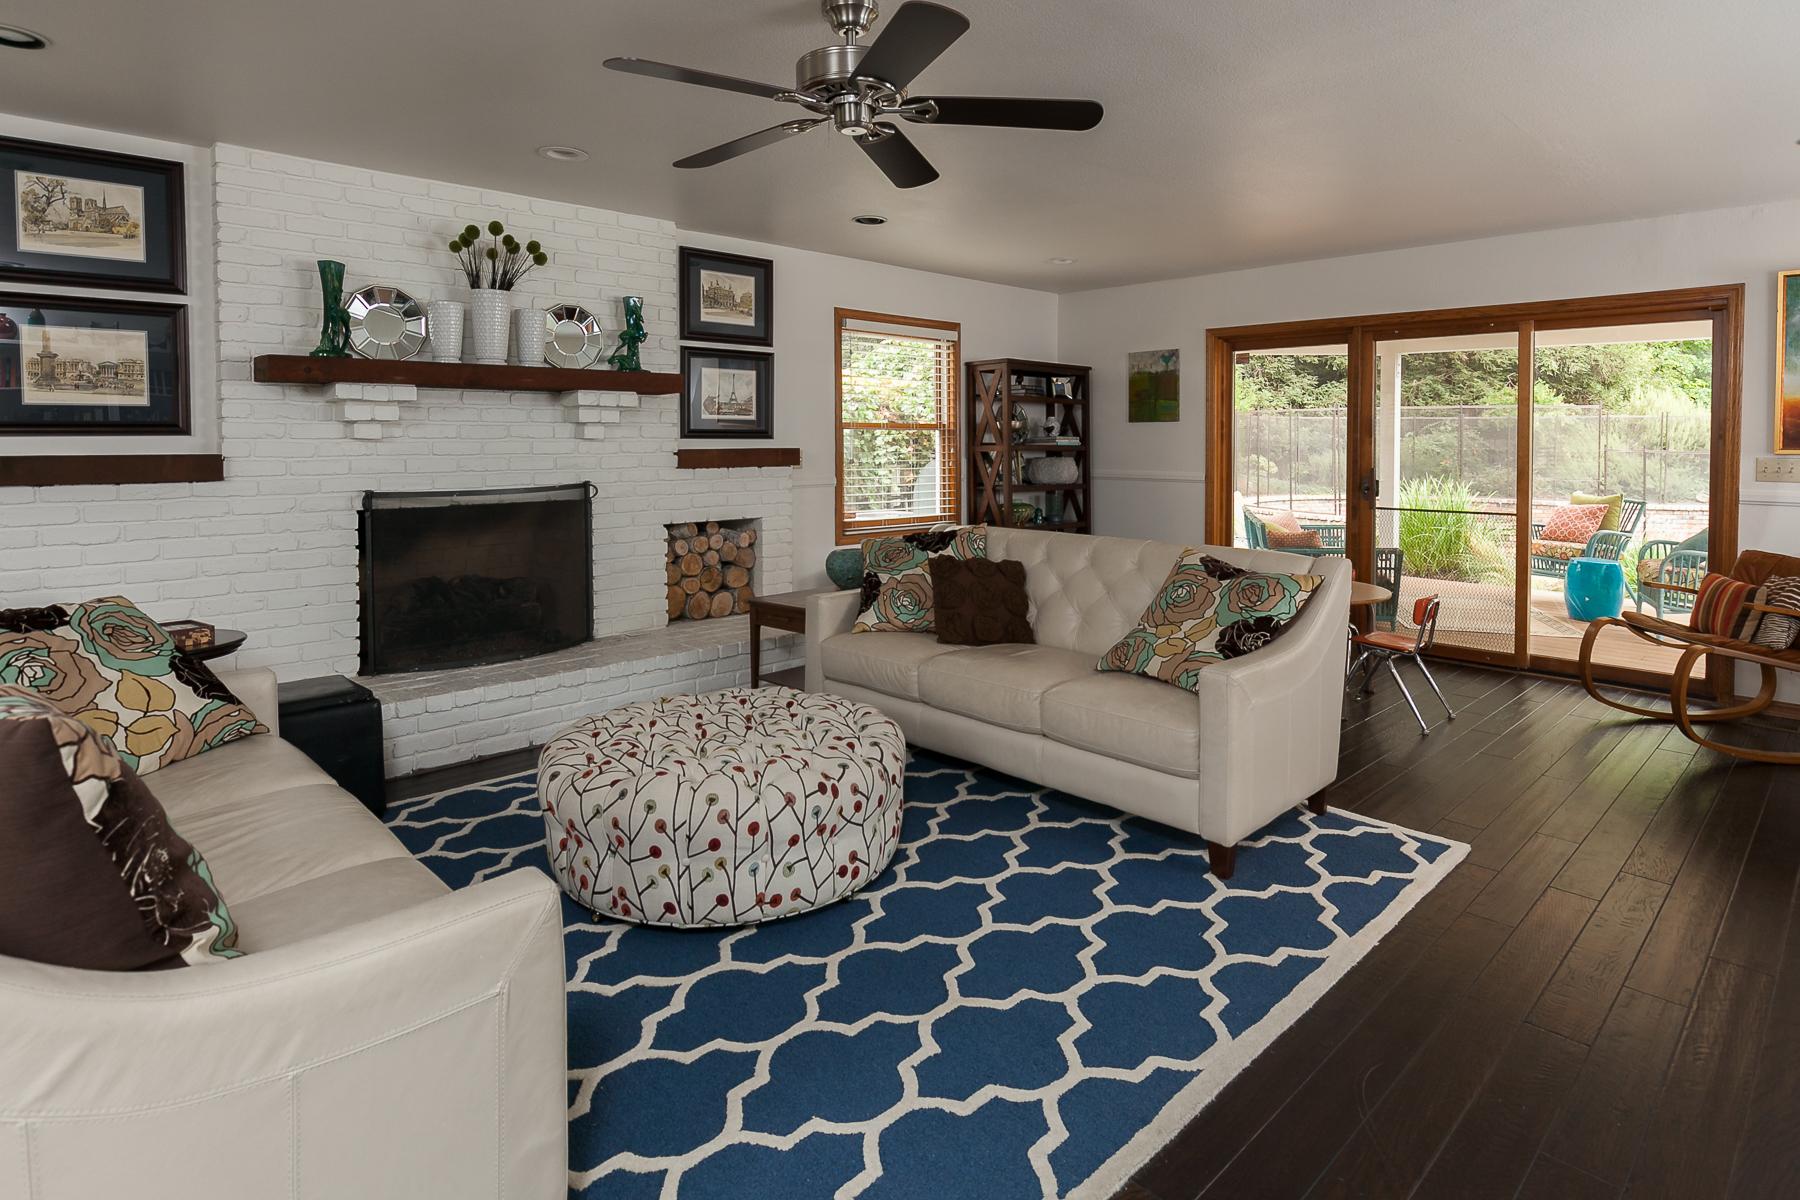 Songbird Residence Living Room Design in Chico, CA